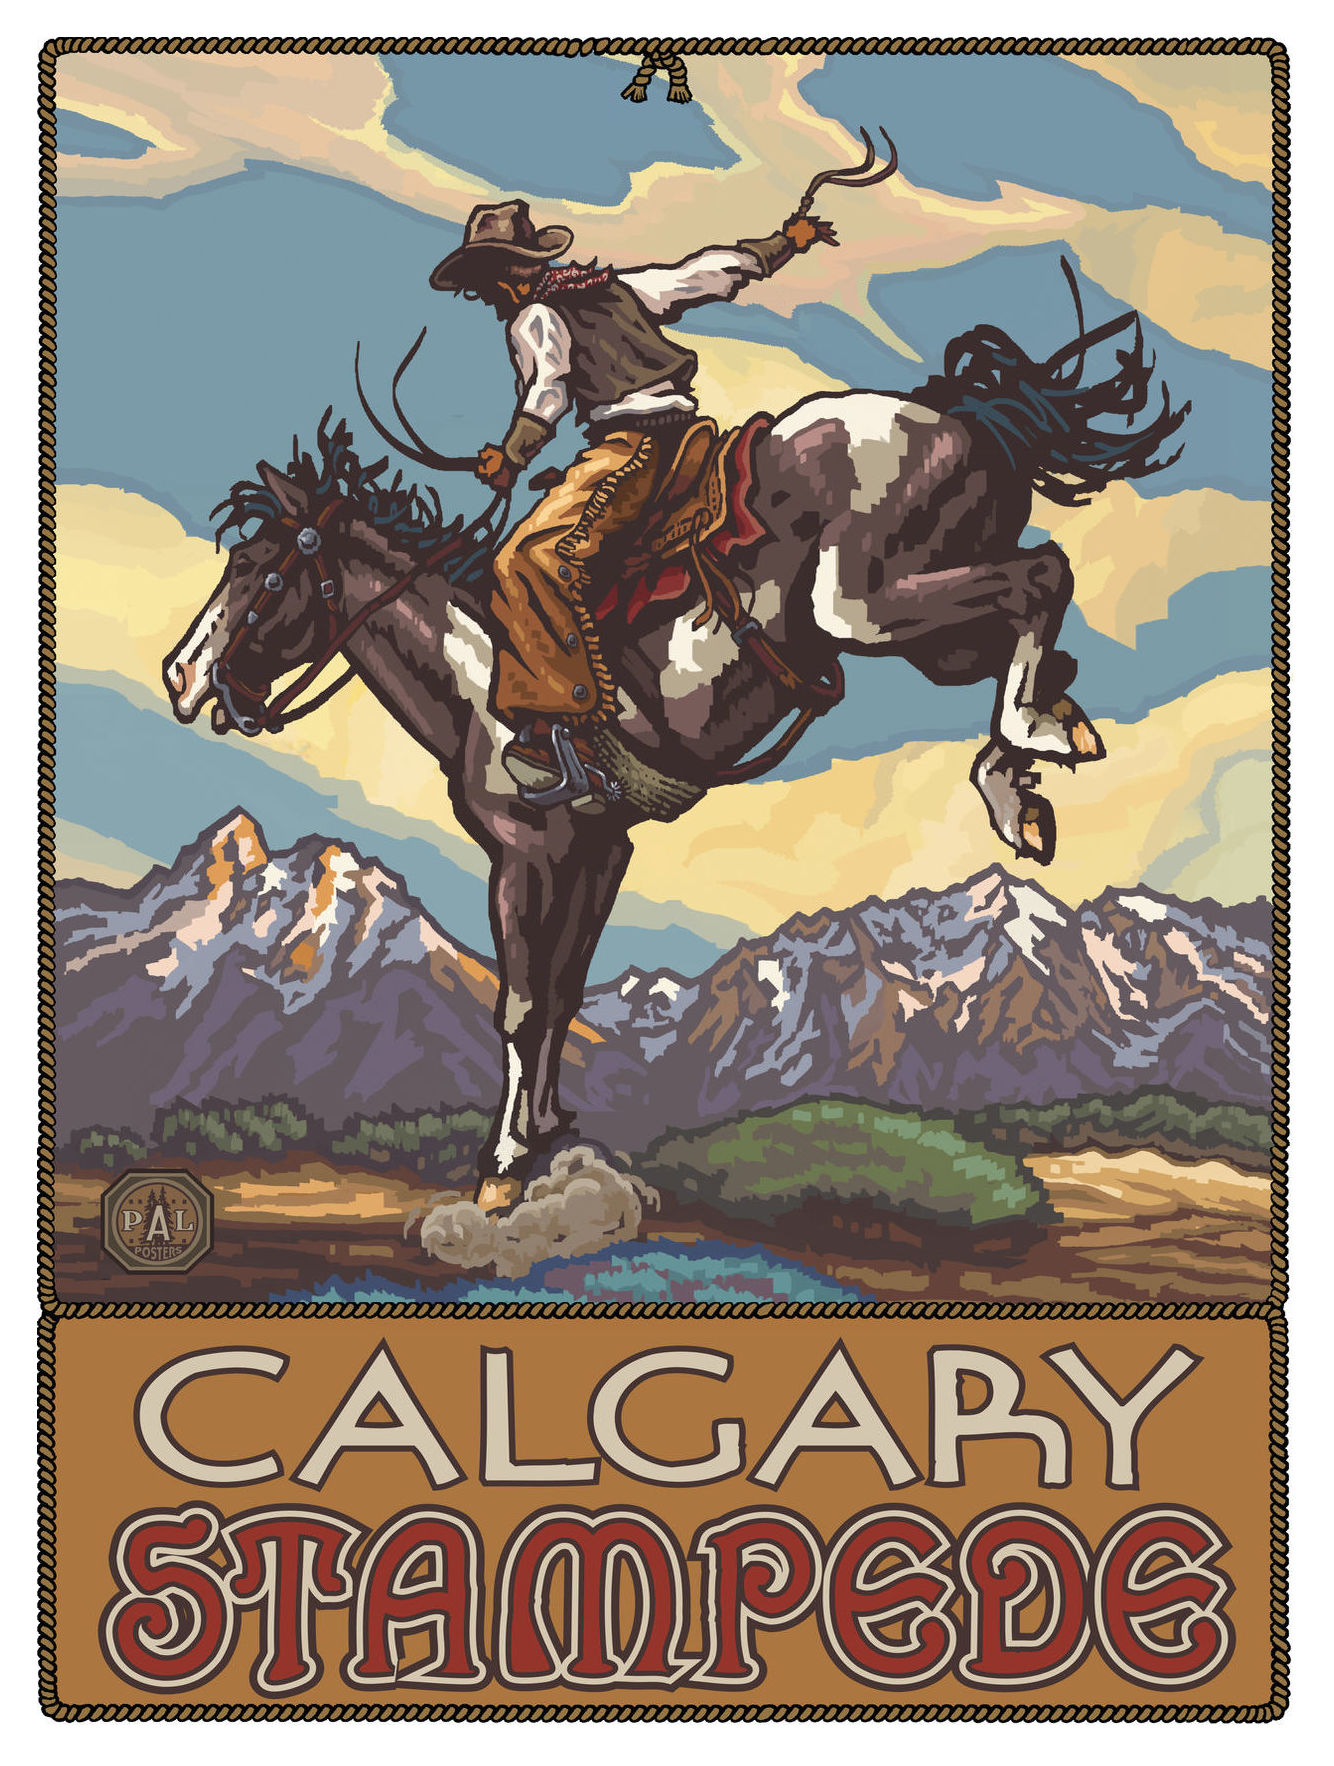 Calgary Stampede Bucking Horse Cowboy Travel Art Print